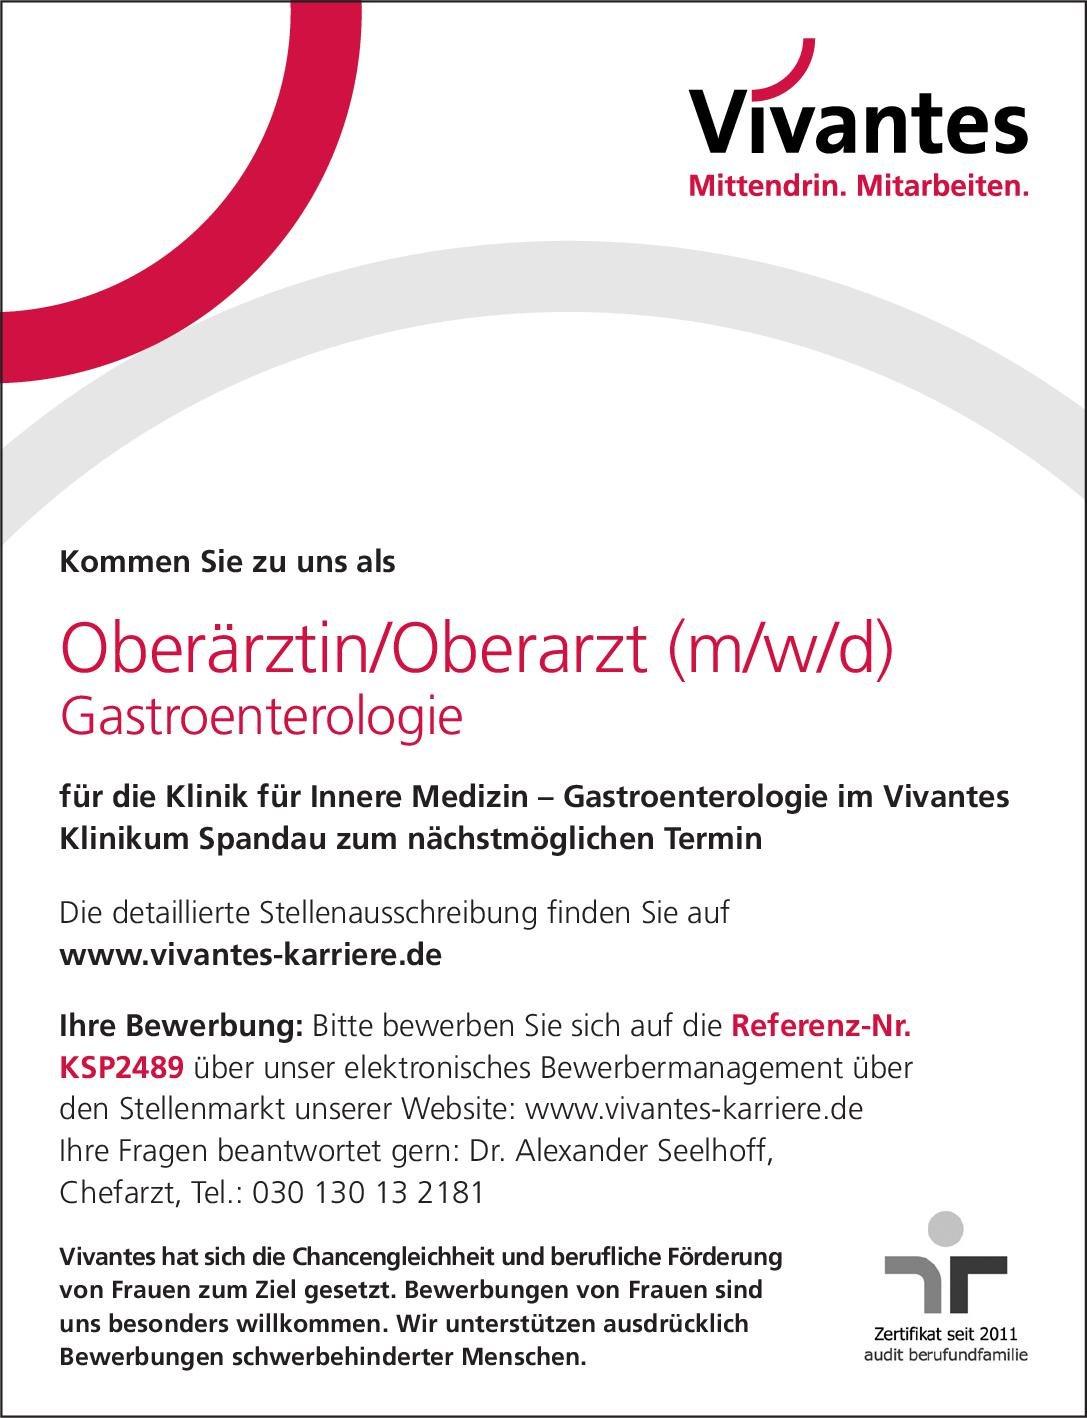 Vivantes Klinikum Spandau Oberärztin/Oberarzt (m/w/d) Gastroenterologie  Innere Medizin und Gastroenterologie, Innere Medizin Oberarzt